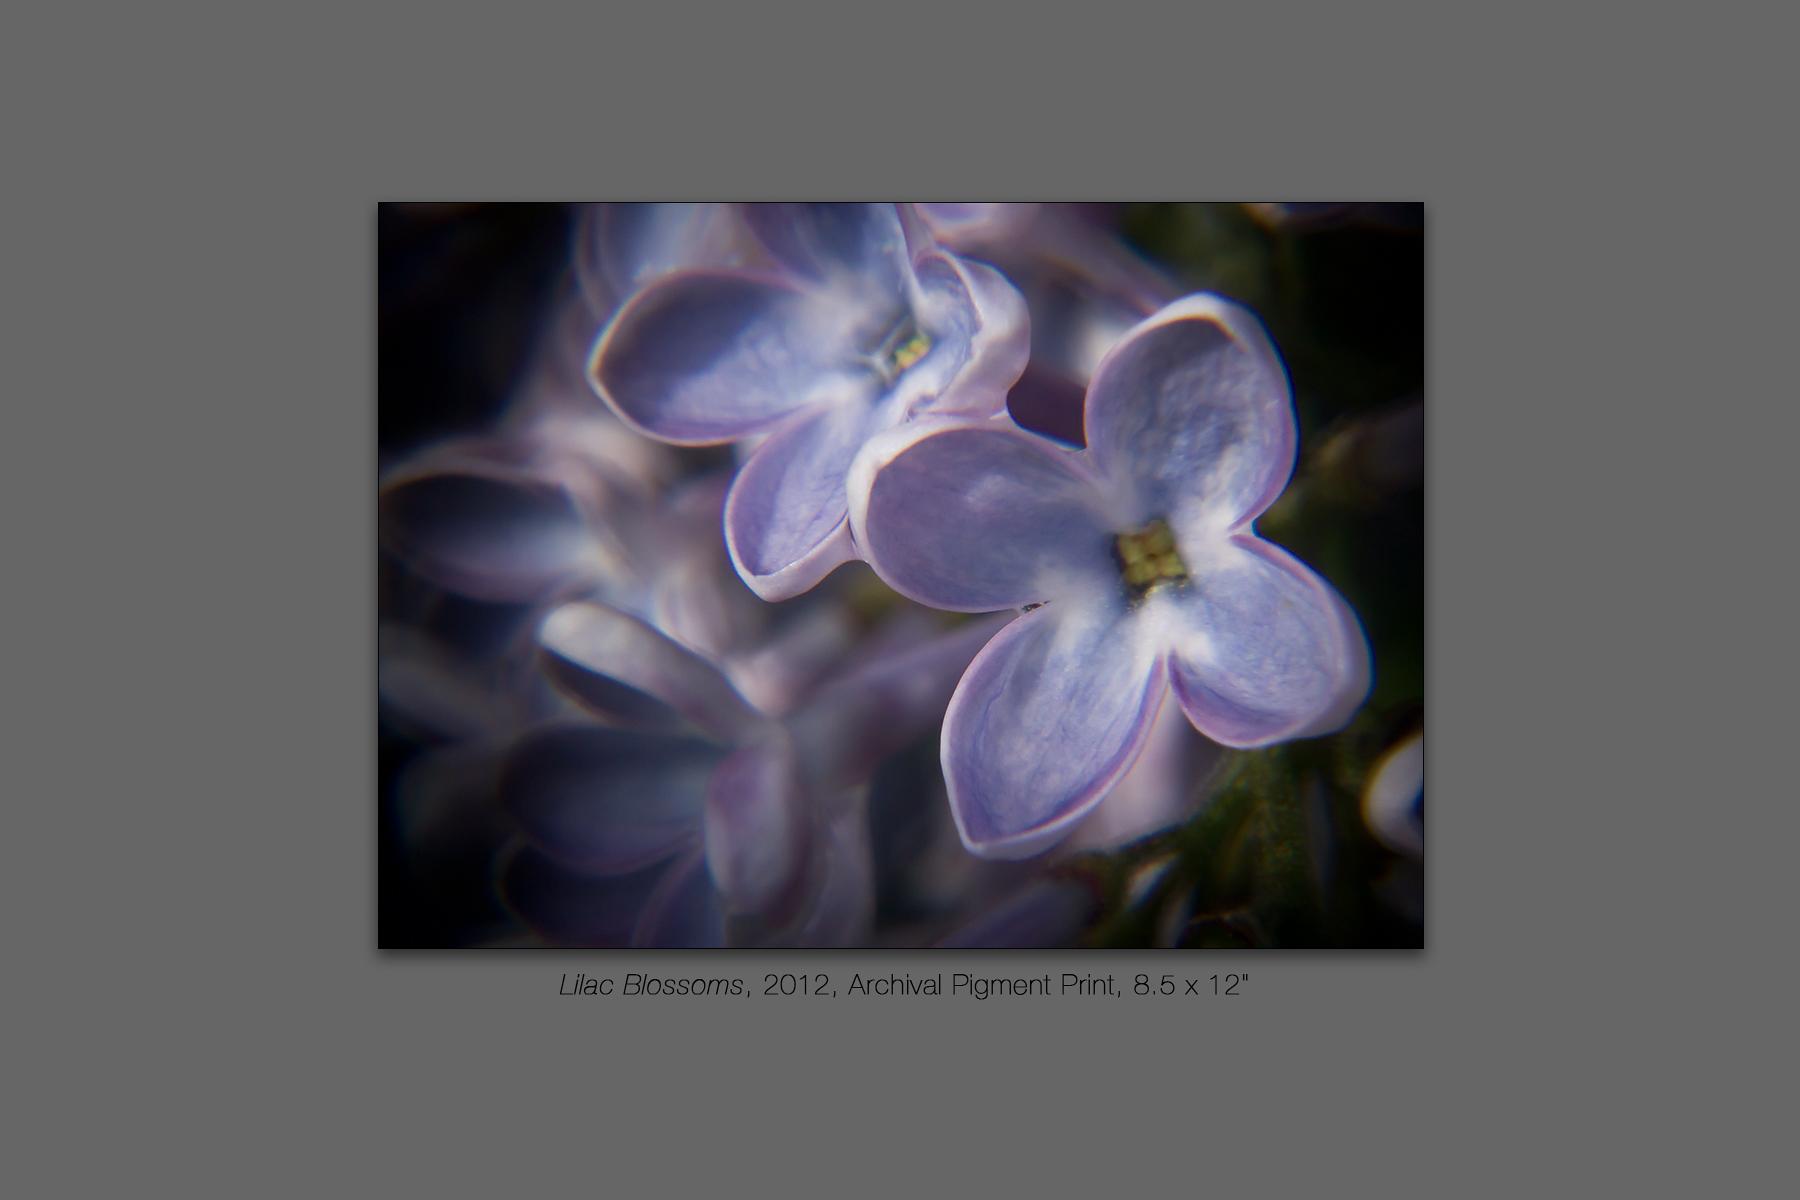 Lilac Blossoms, 2012